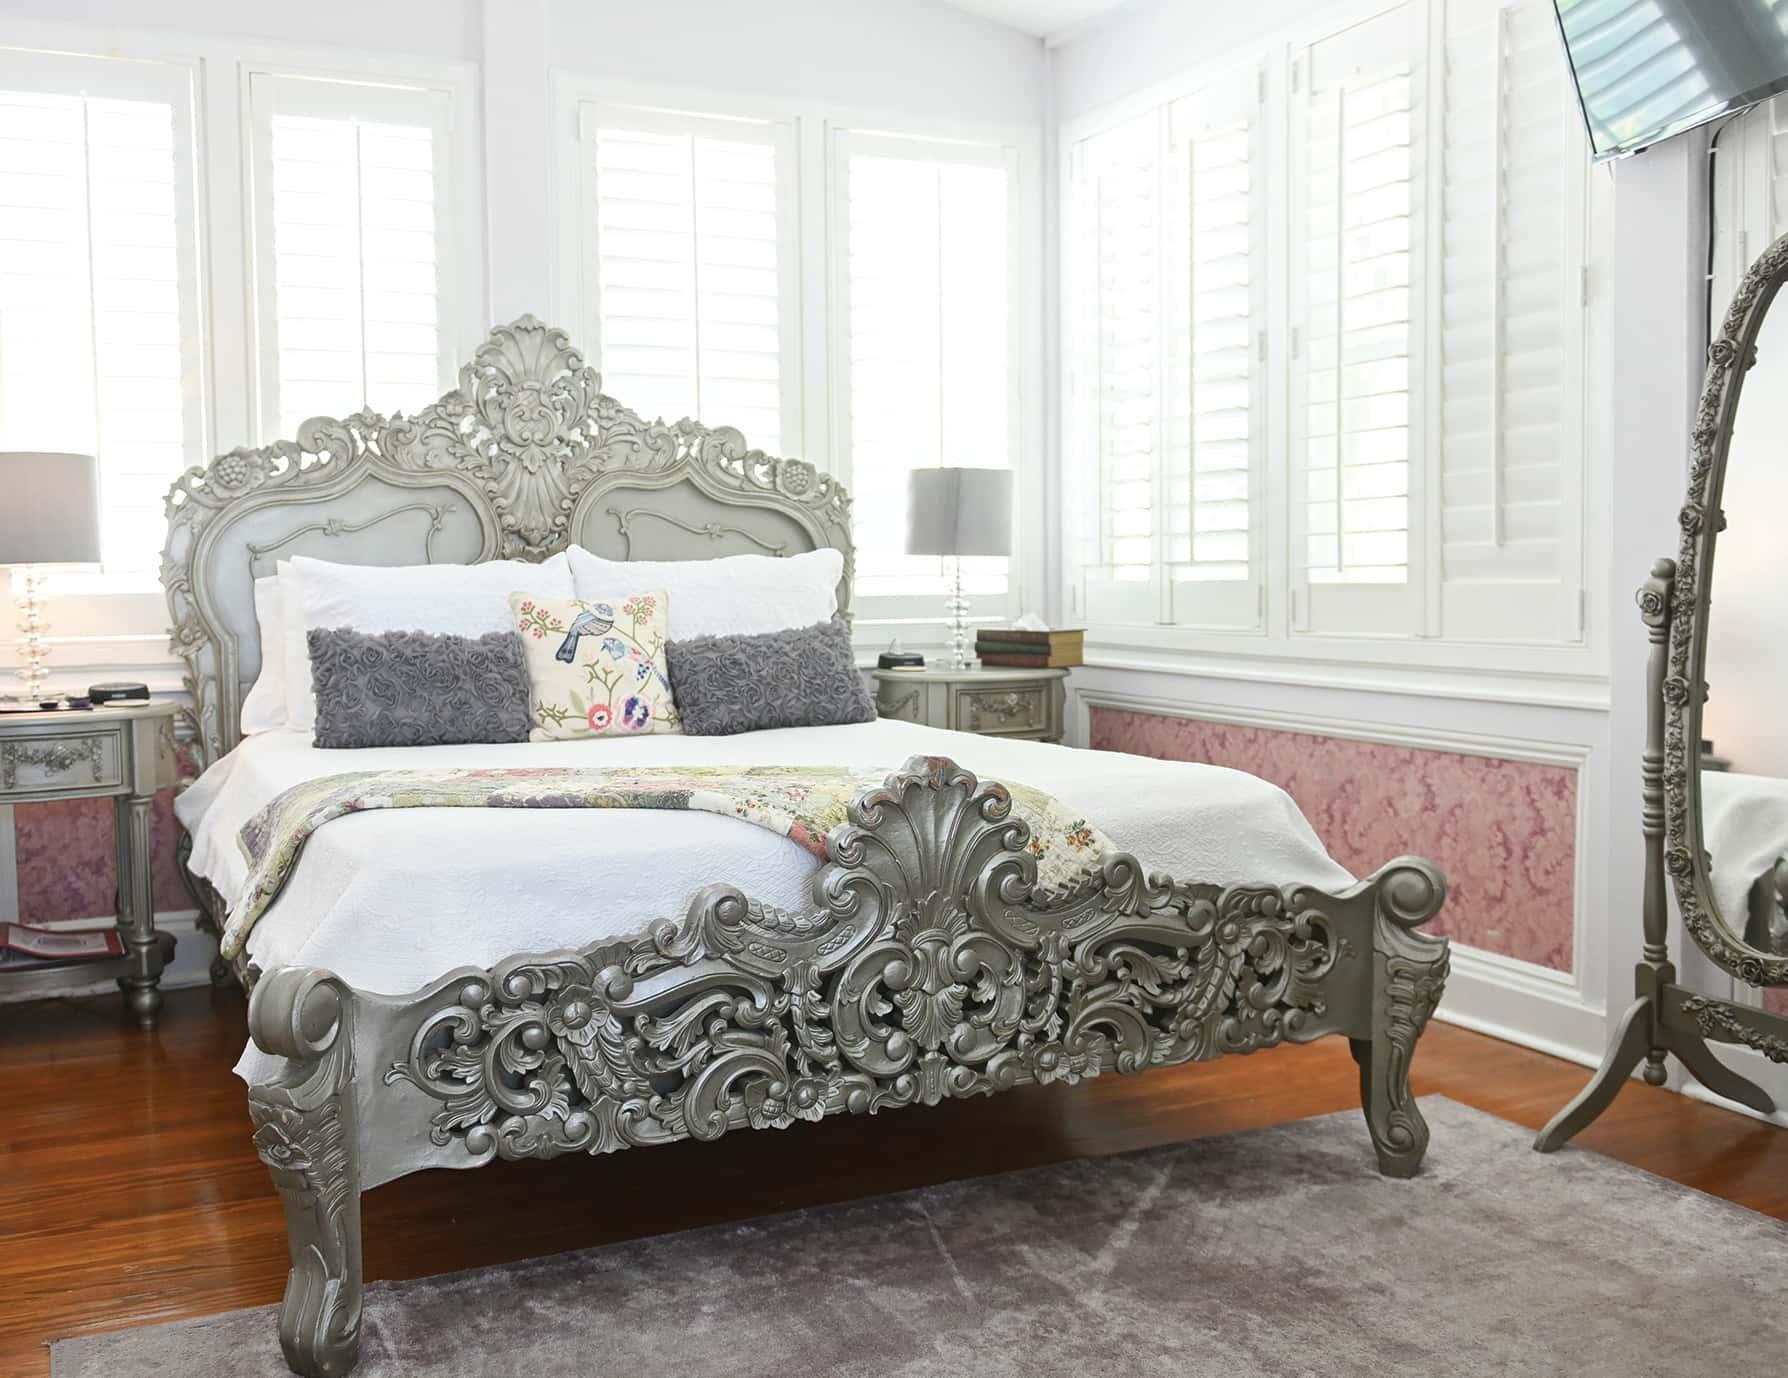 Sun Room bed - Romantic Key West Lodging